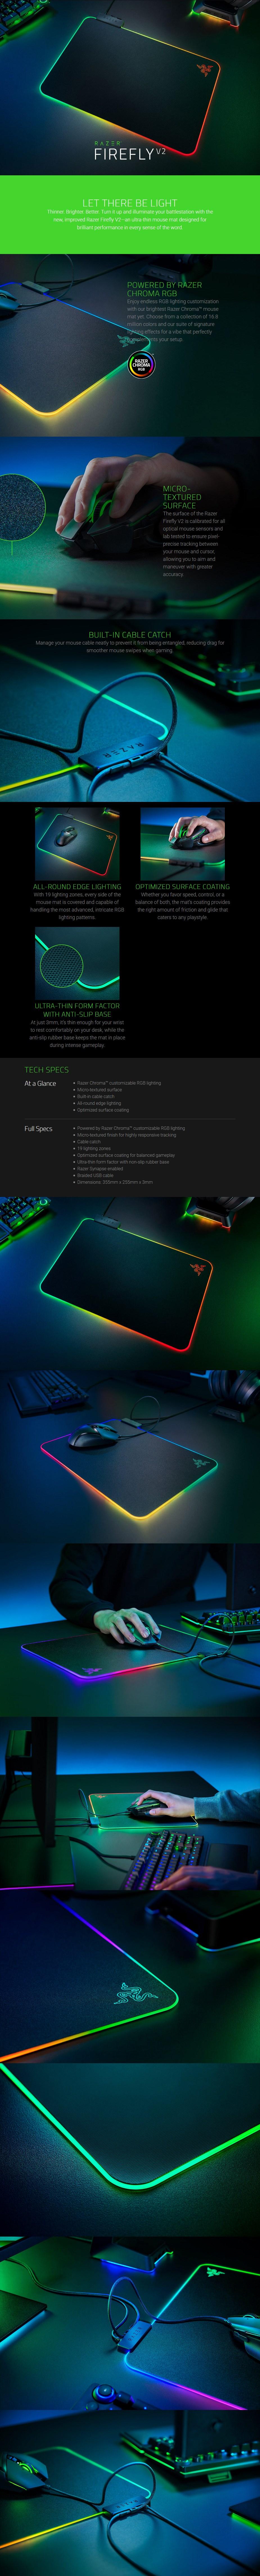 razer-firefly-v2-chroma-rgb-hard-gaming-mouse-pad-ac34222-6.jpg